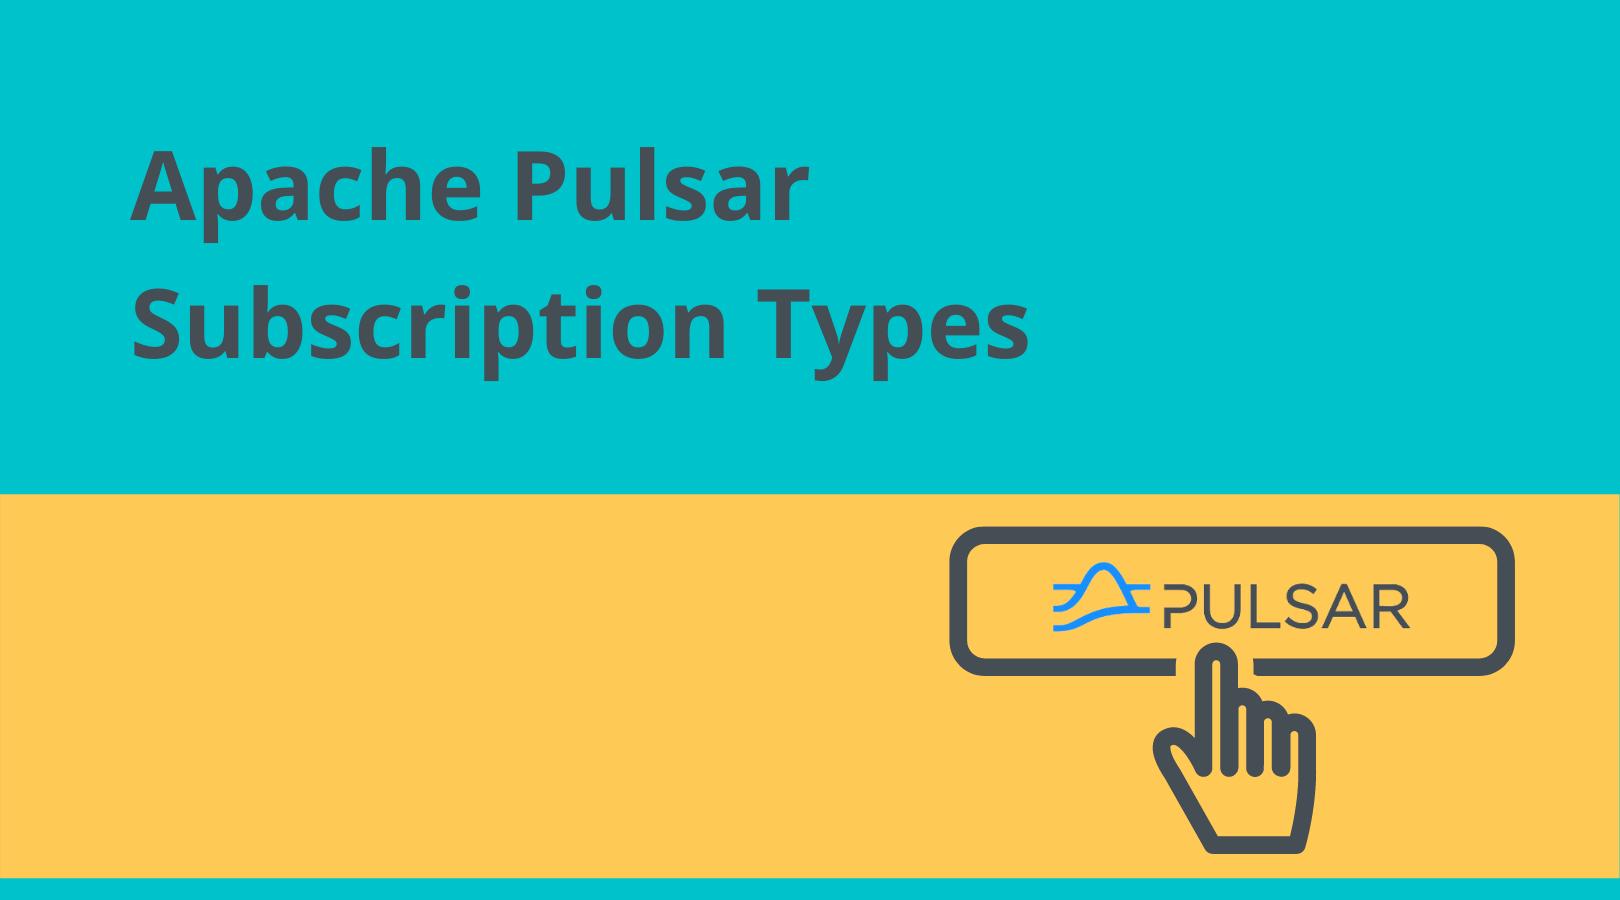 Apache Pulsar Subscriptions